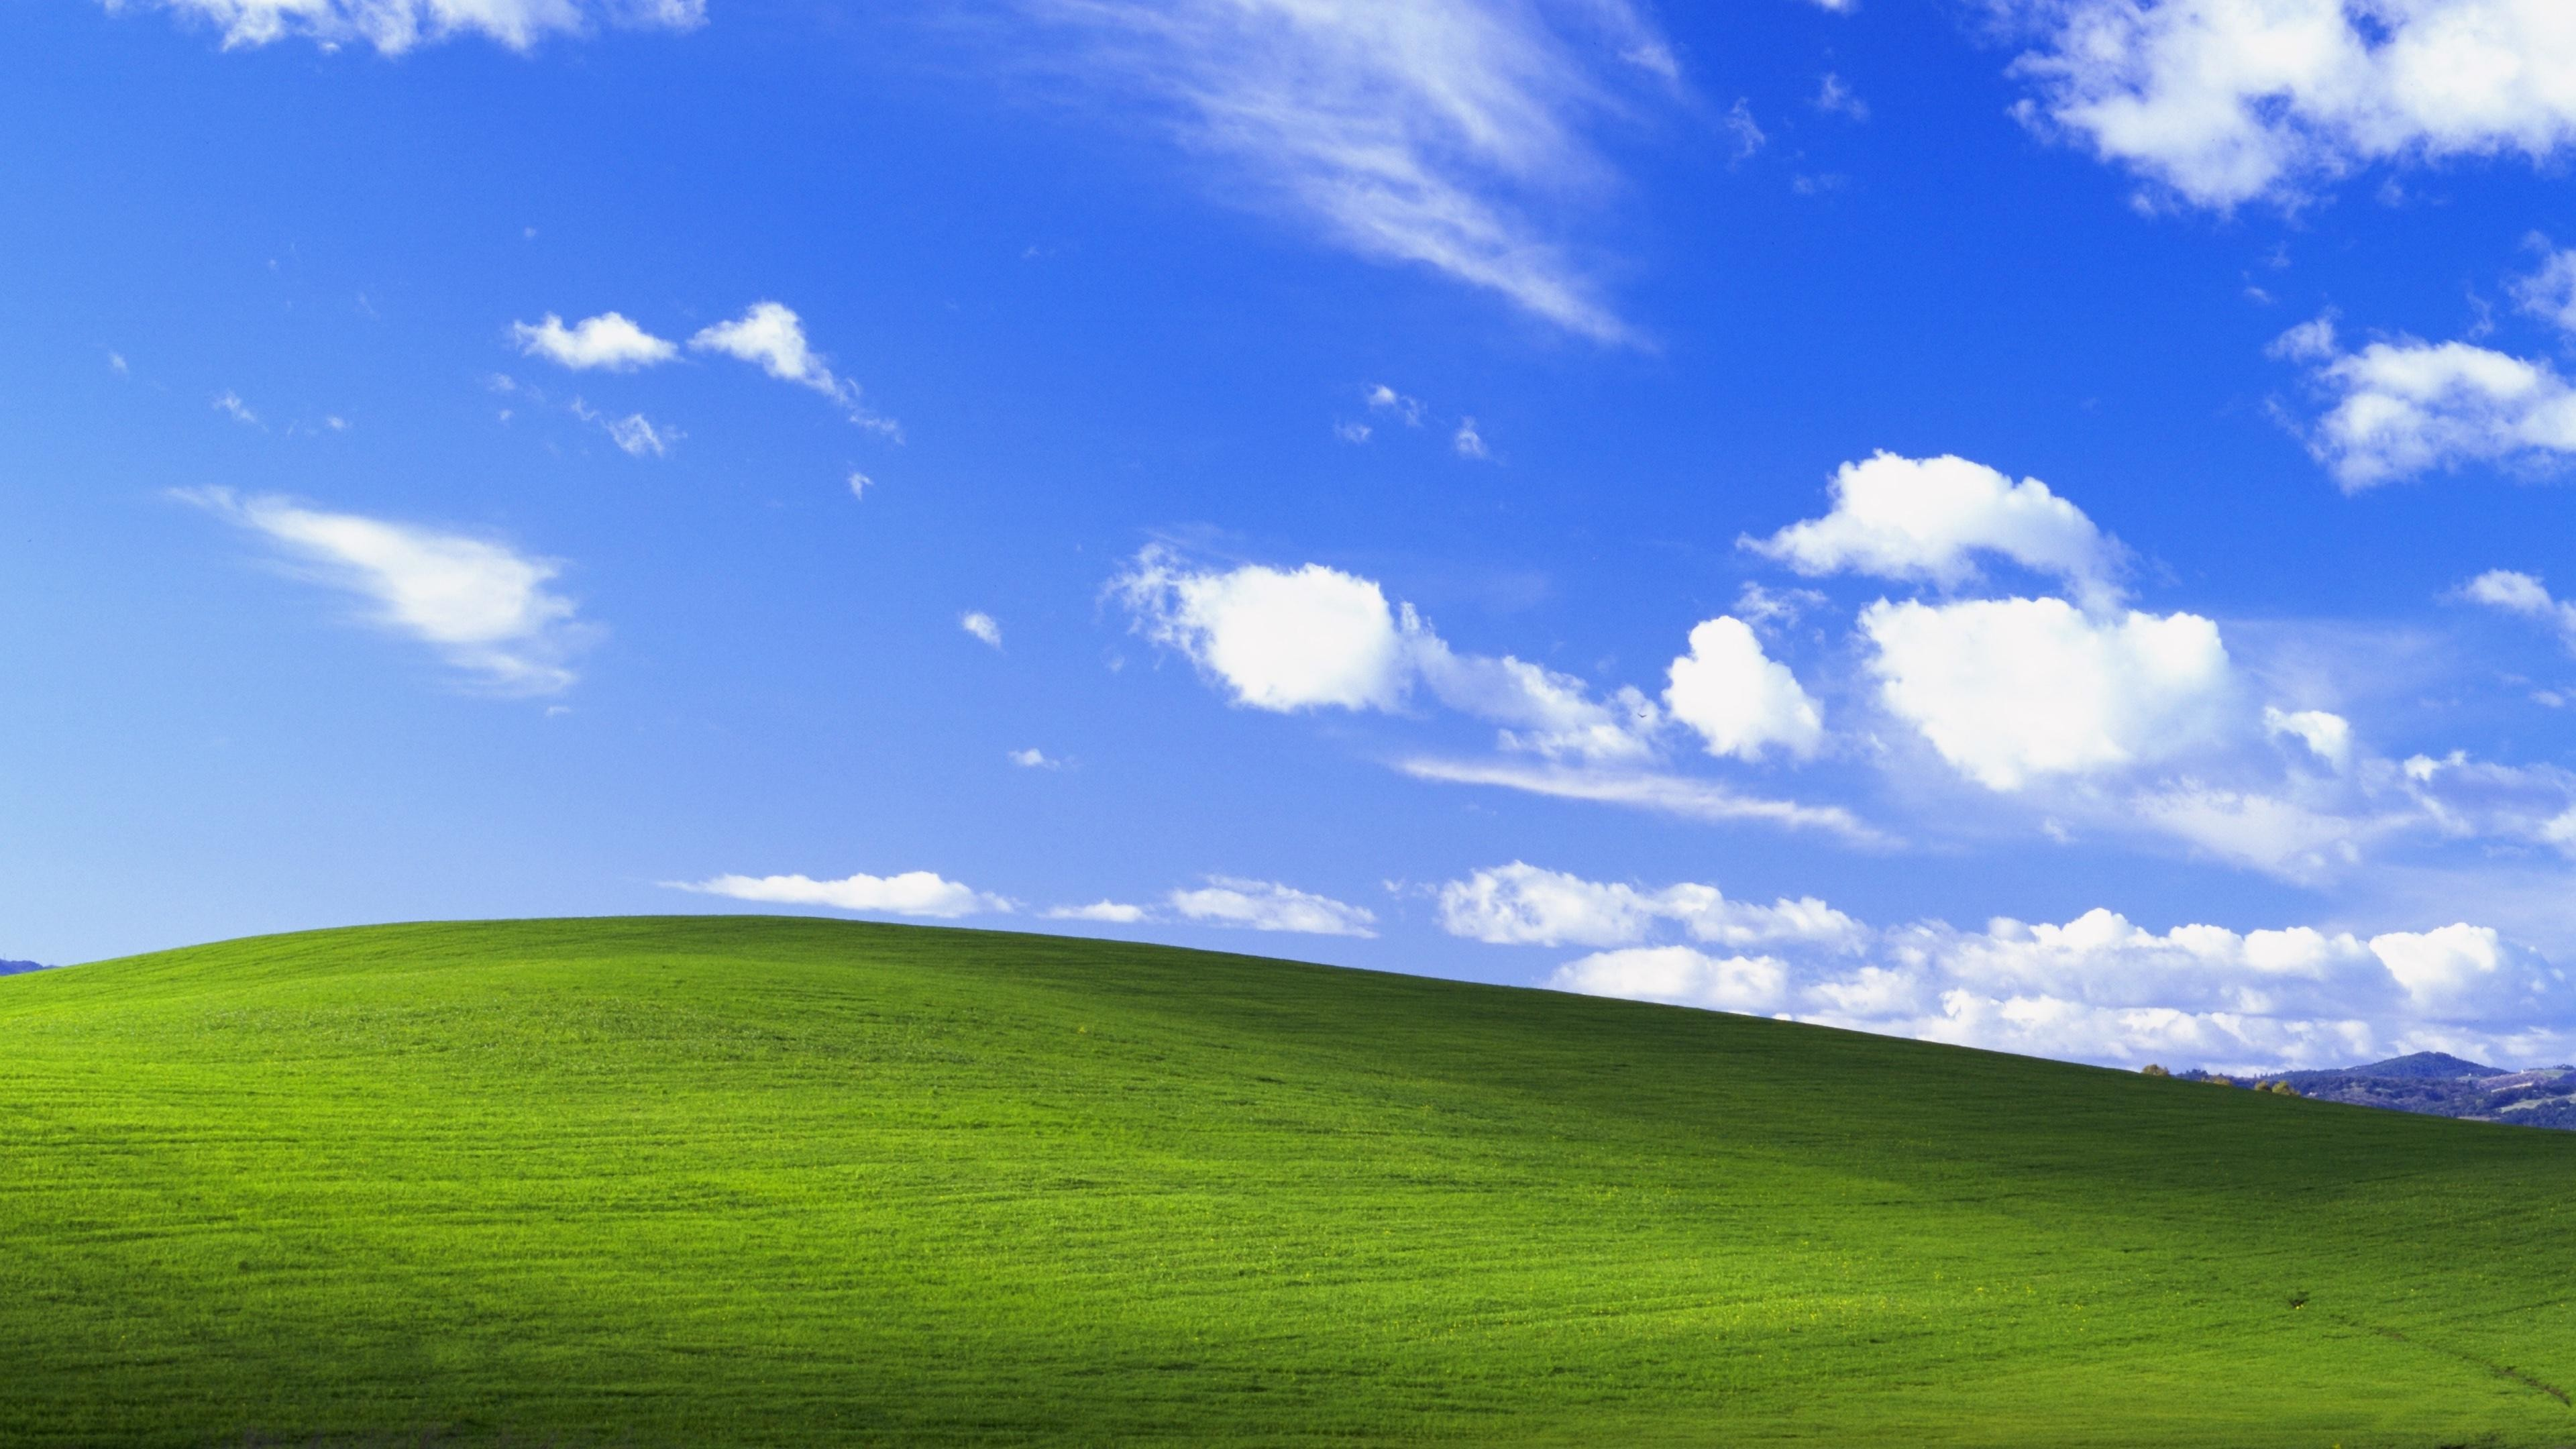 NostalgiaHere's the Windows XP wallpaper in glorious 4K res.